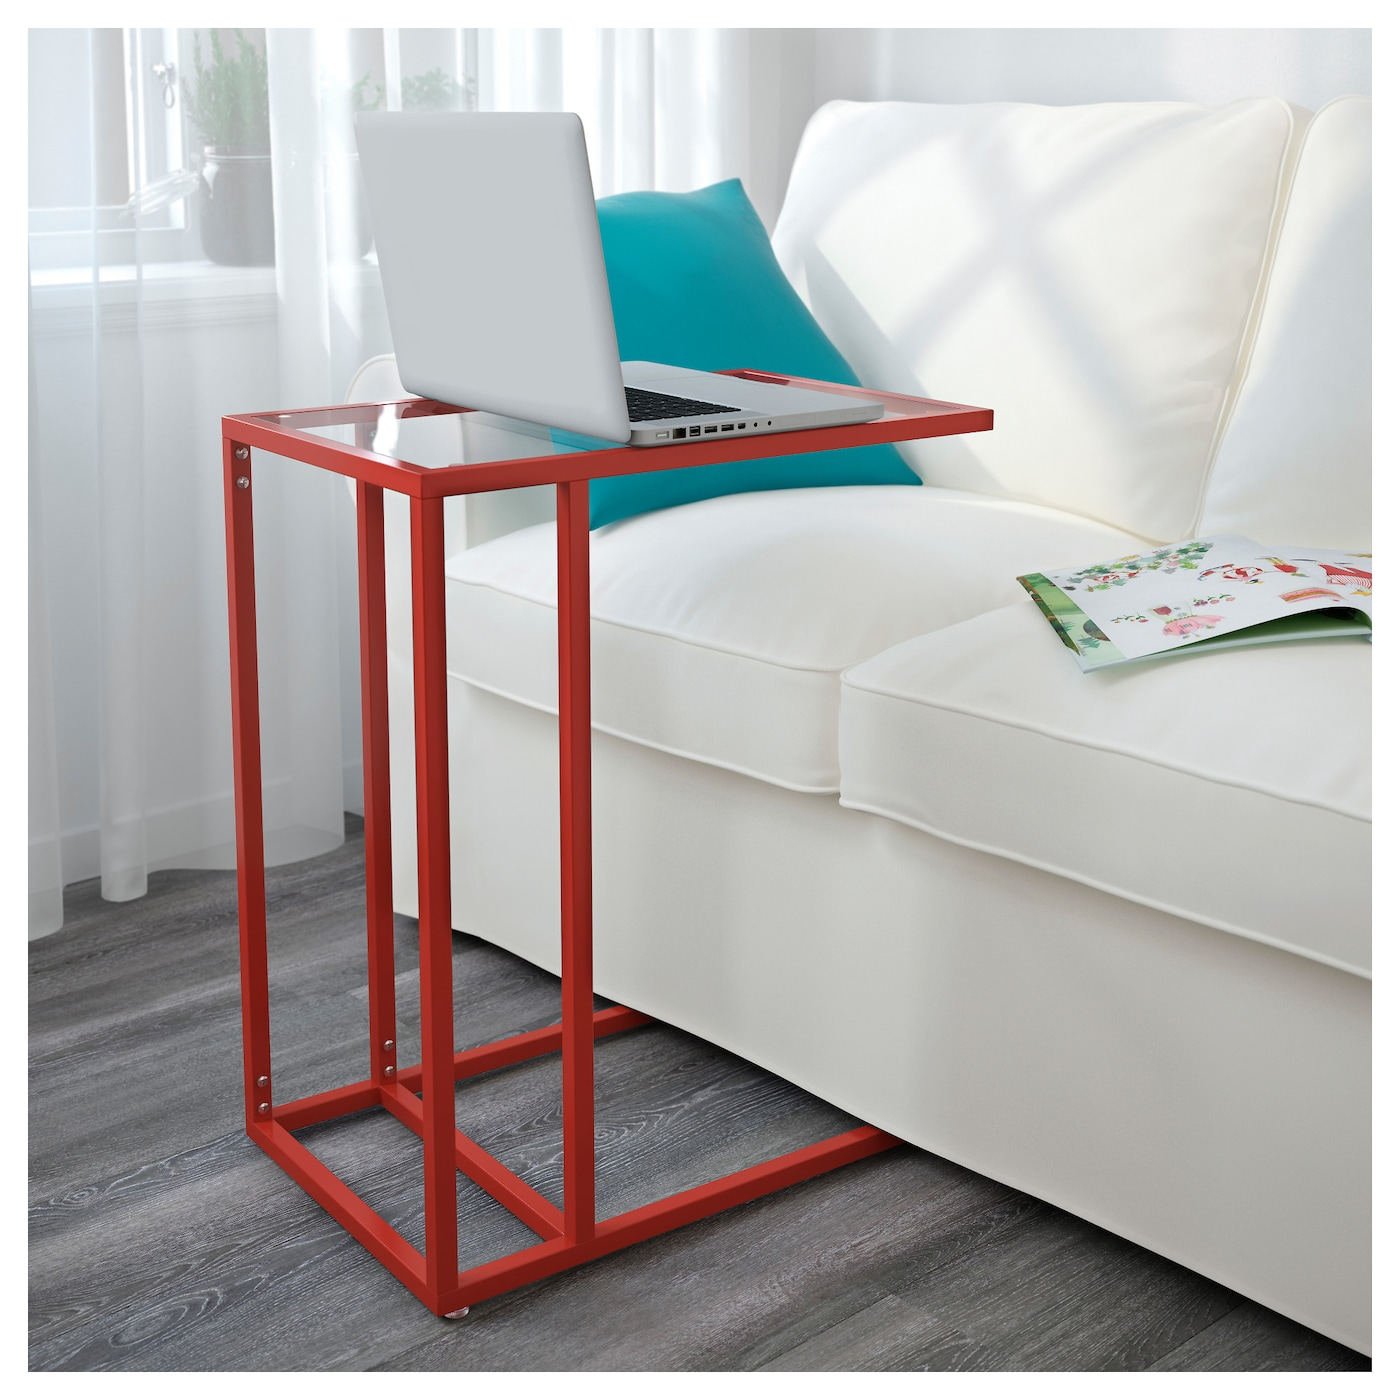 vittsj laptop stand red glass 35x65 cm ikea. Black Bedroom Furniture Sets. Home Design Ideas